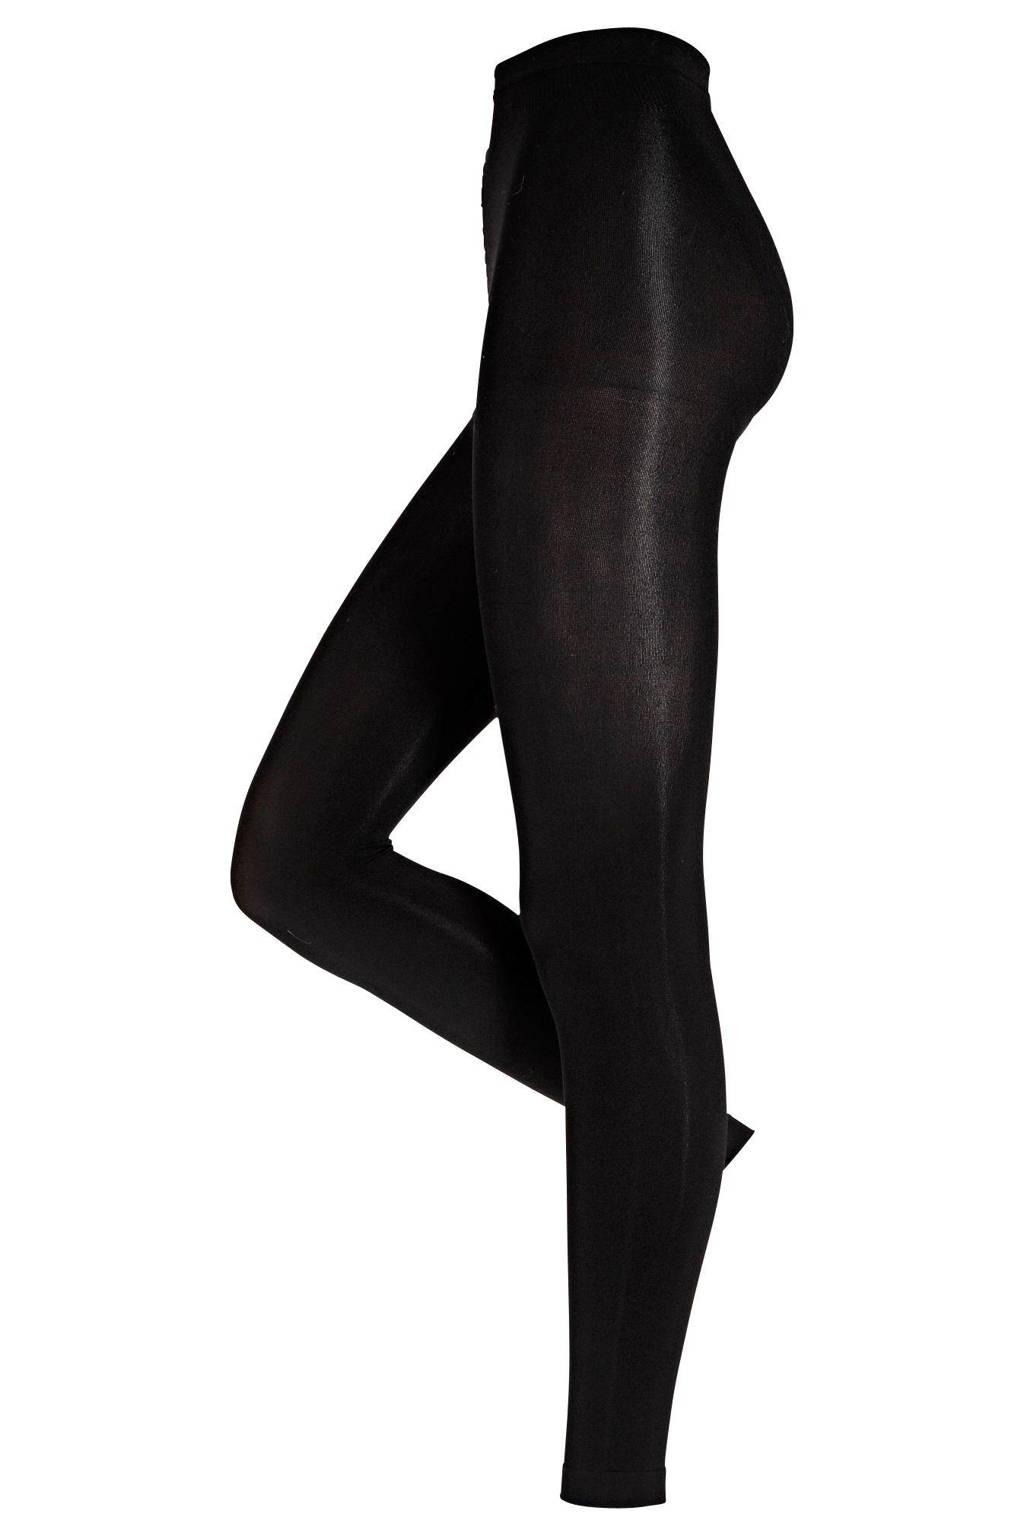 MAGIC Bodyfashion corrigerende legging zwart, Zwart